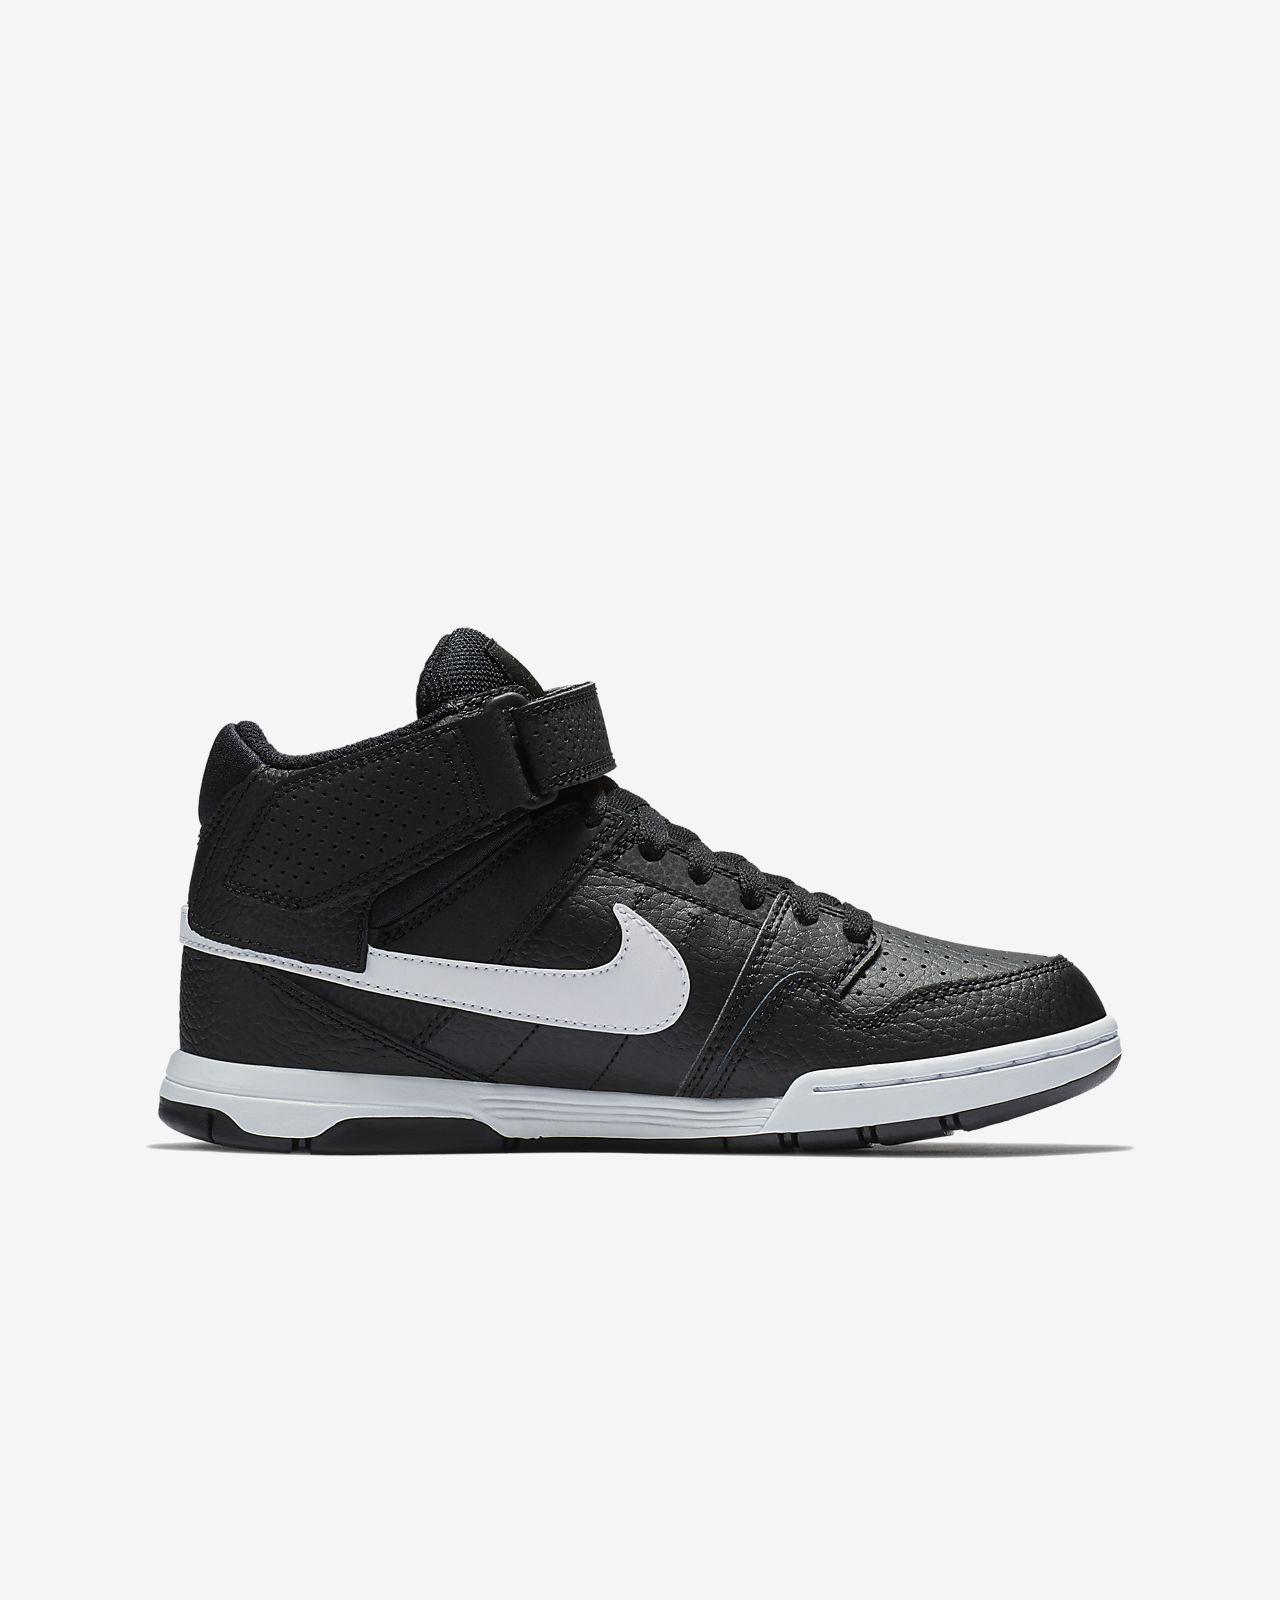 New Nike Girls or Boys Mogan MID 2JR B 645025 036 Shoes Size 5